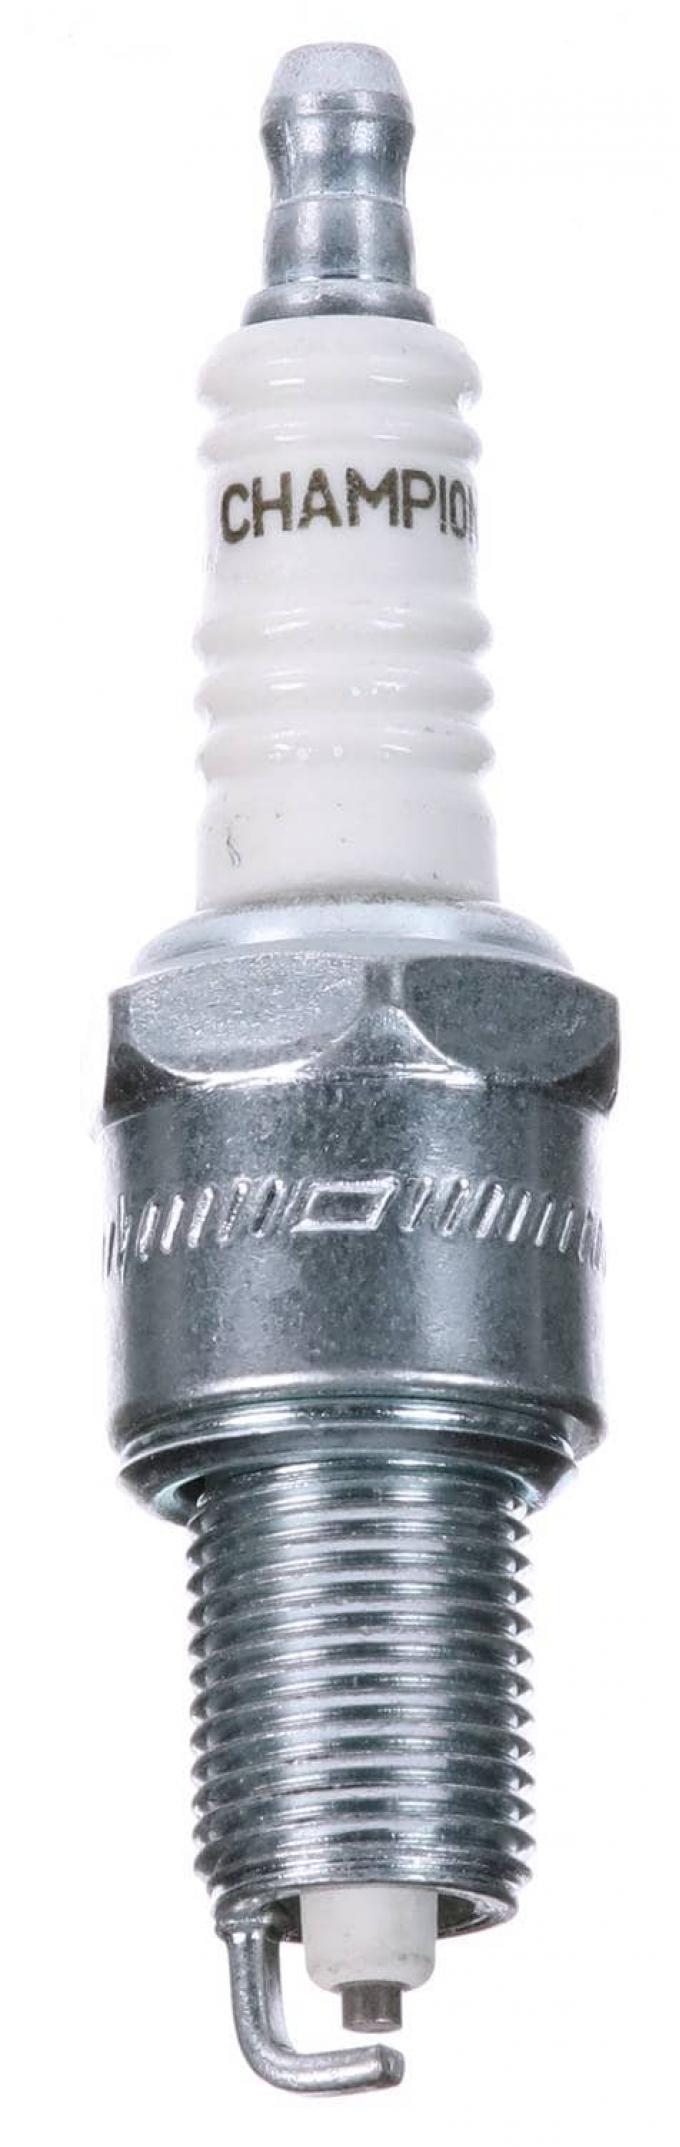 Champion Copper Plus Plug Number RN14YC Spark Plug 405